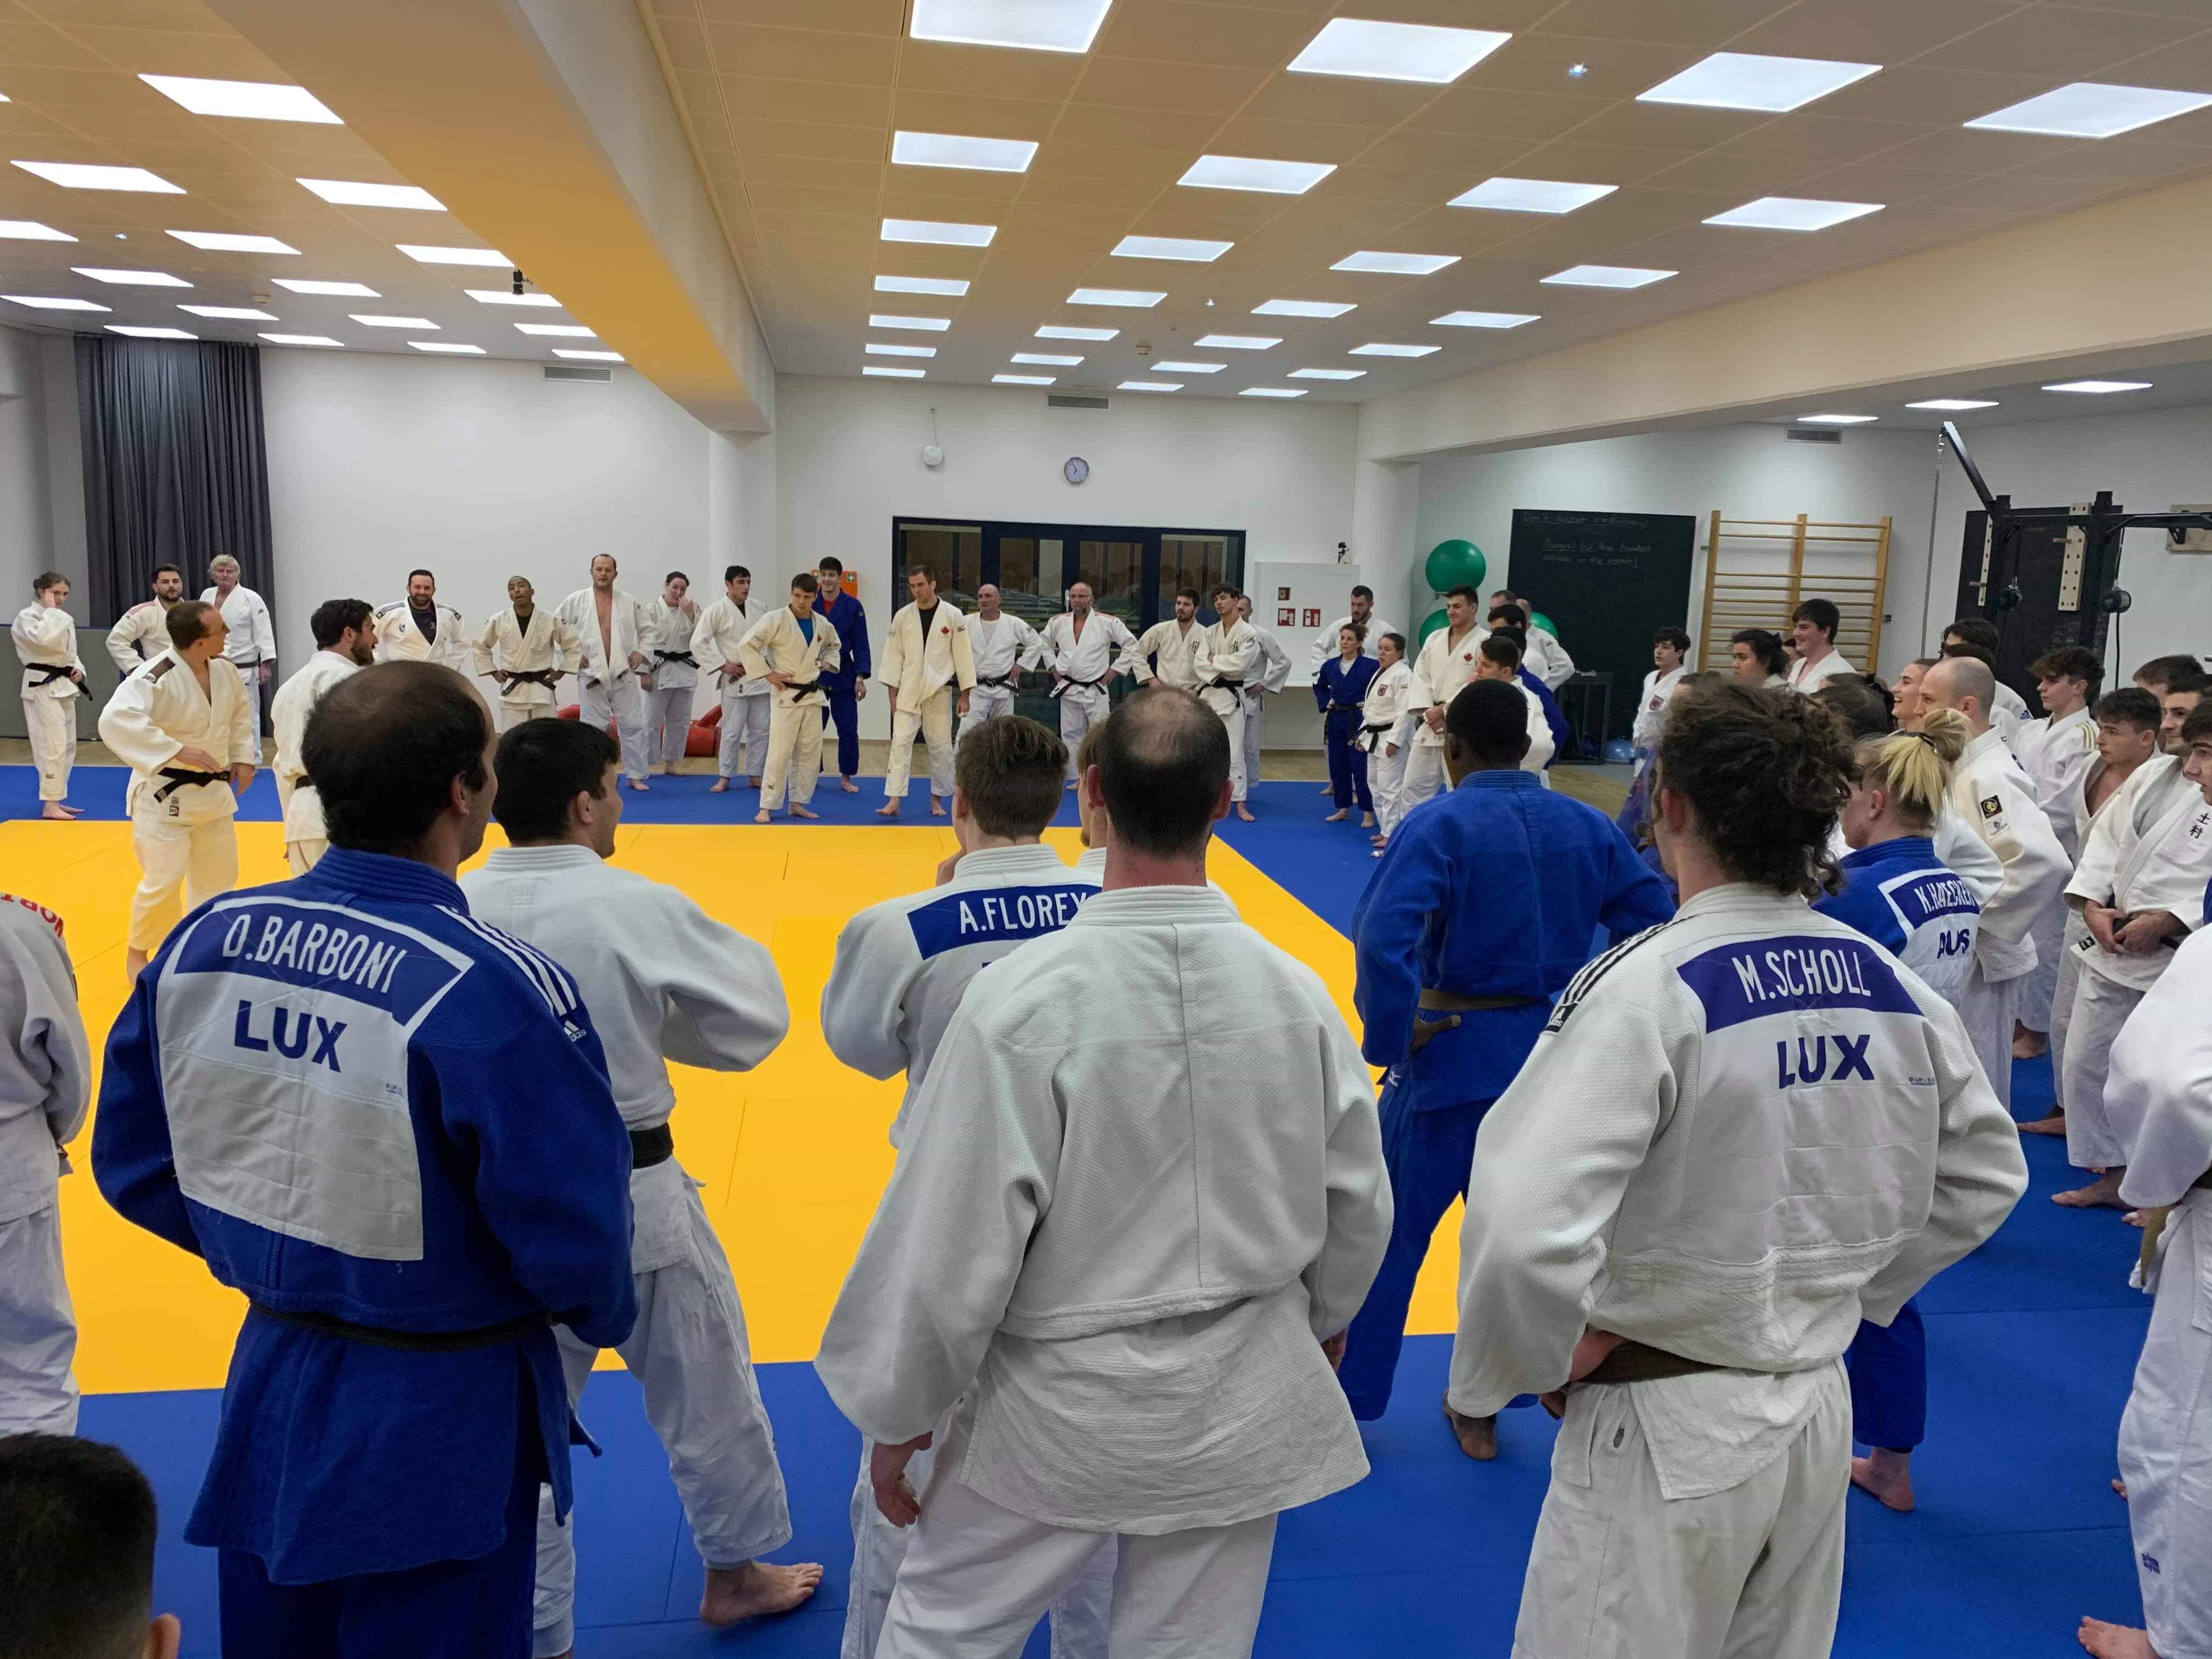 Interreg Judo Training - Luxembourg 19.02.2020